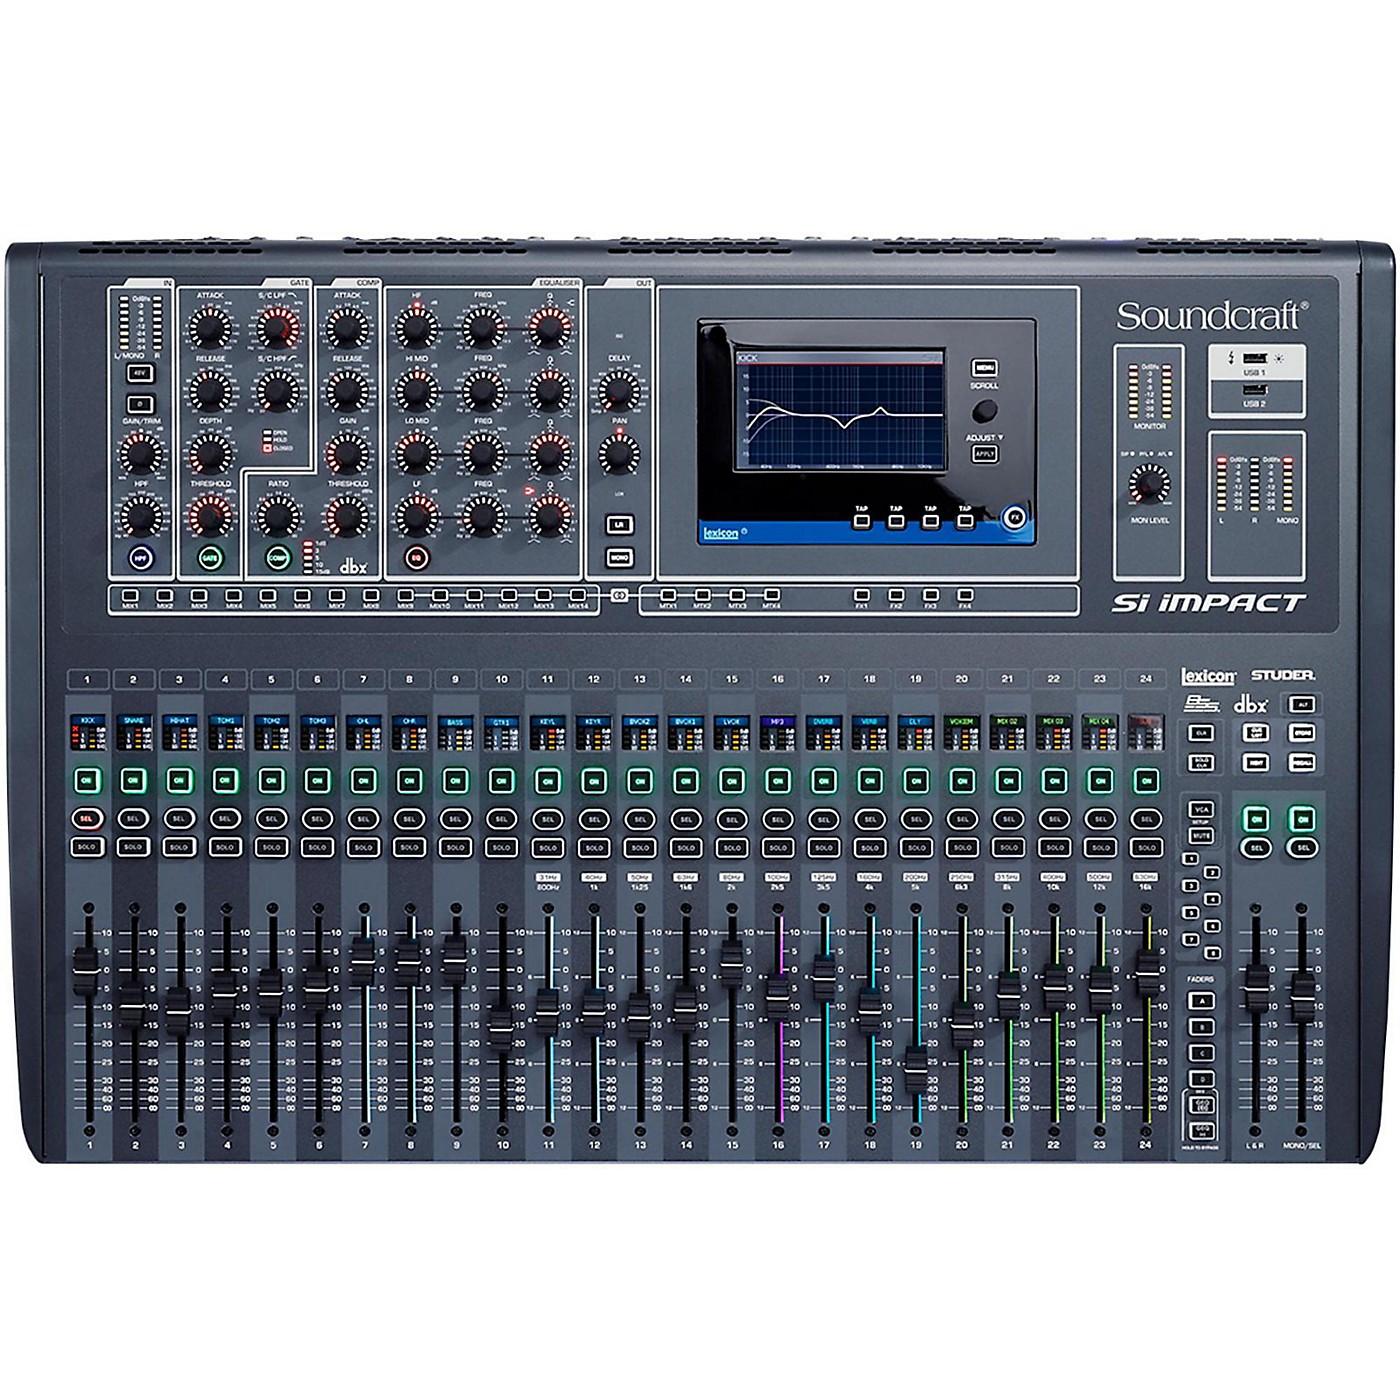 Soundcraft Si Impact 32-Channel Digital Mixer thumbnail